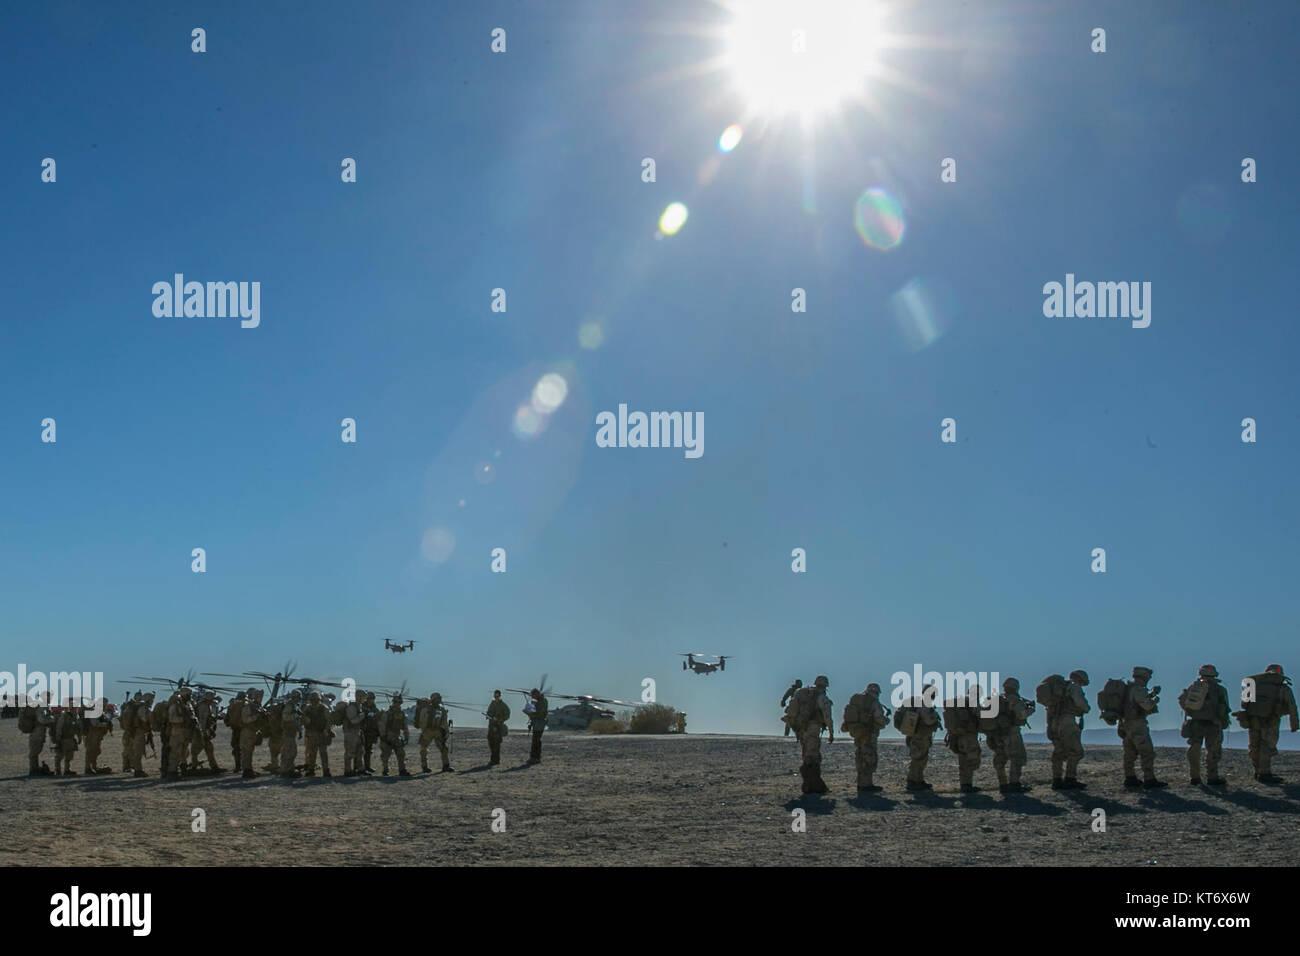 U.S. Marines with 2nd Battalion, 5th Marine Regiment, 1st Marine Division (MARDIV), standby to board an MV-22 Osprey - Stock Image